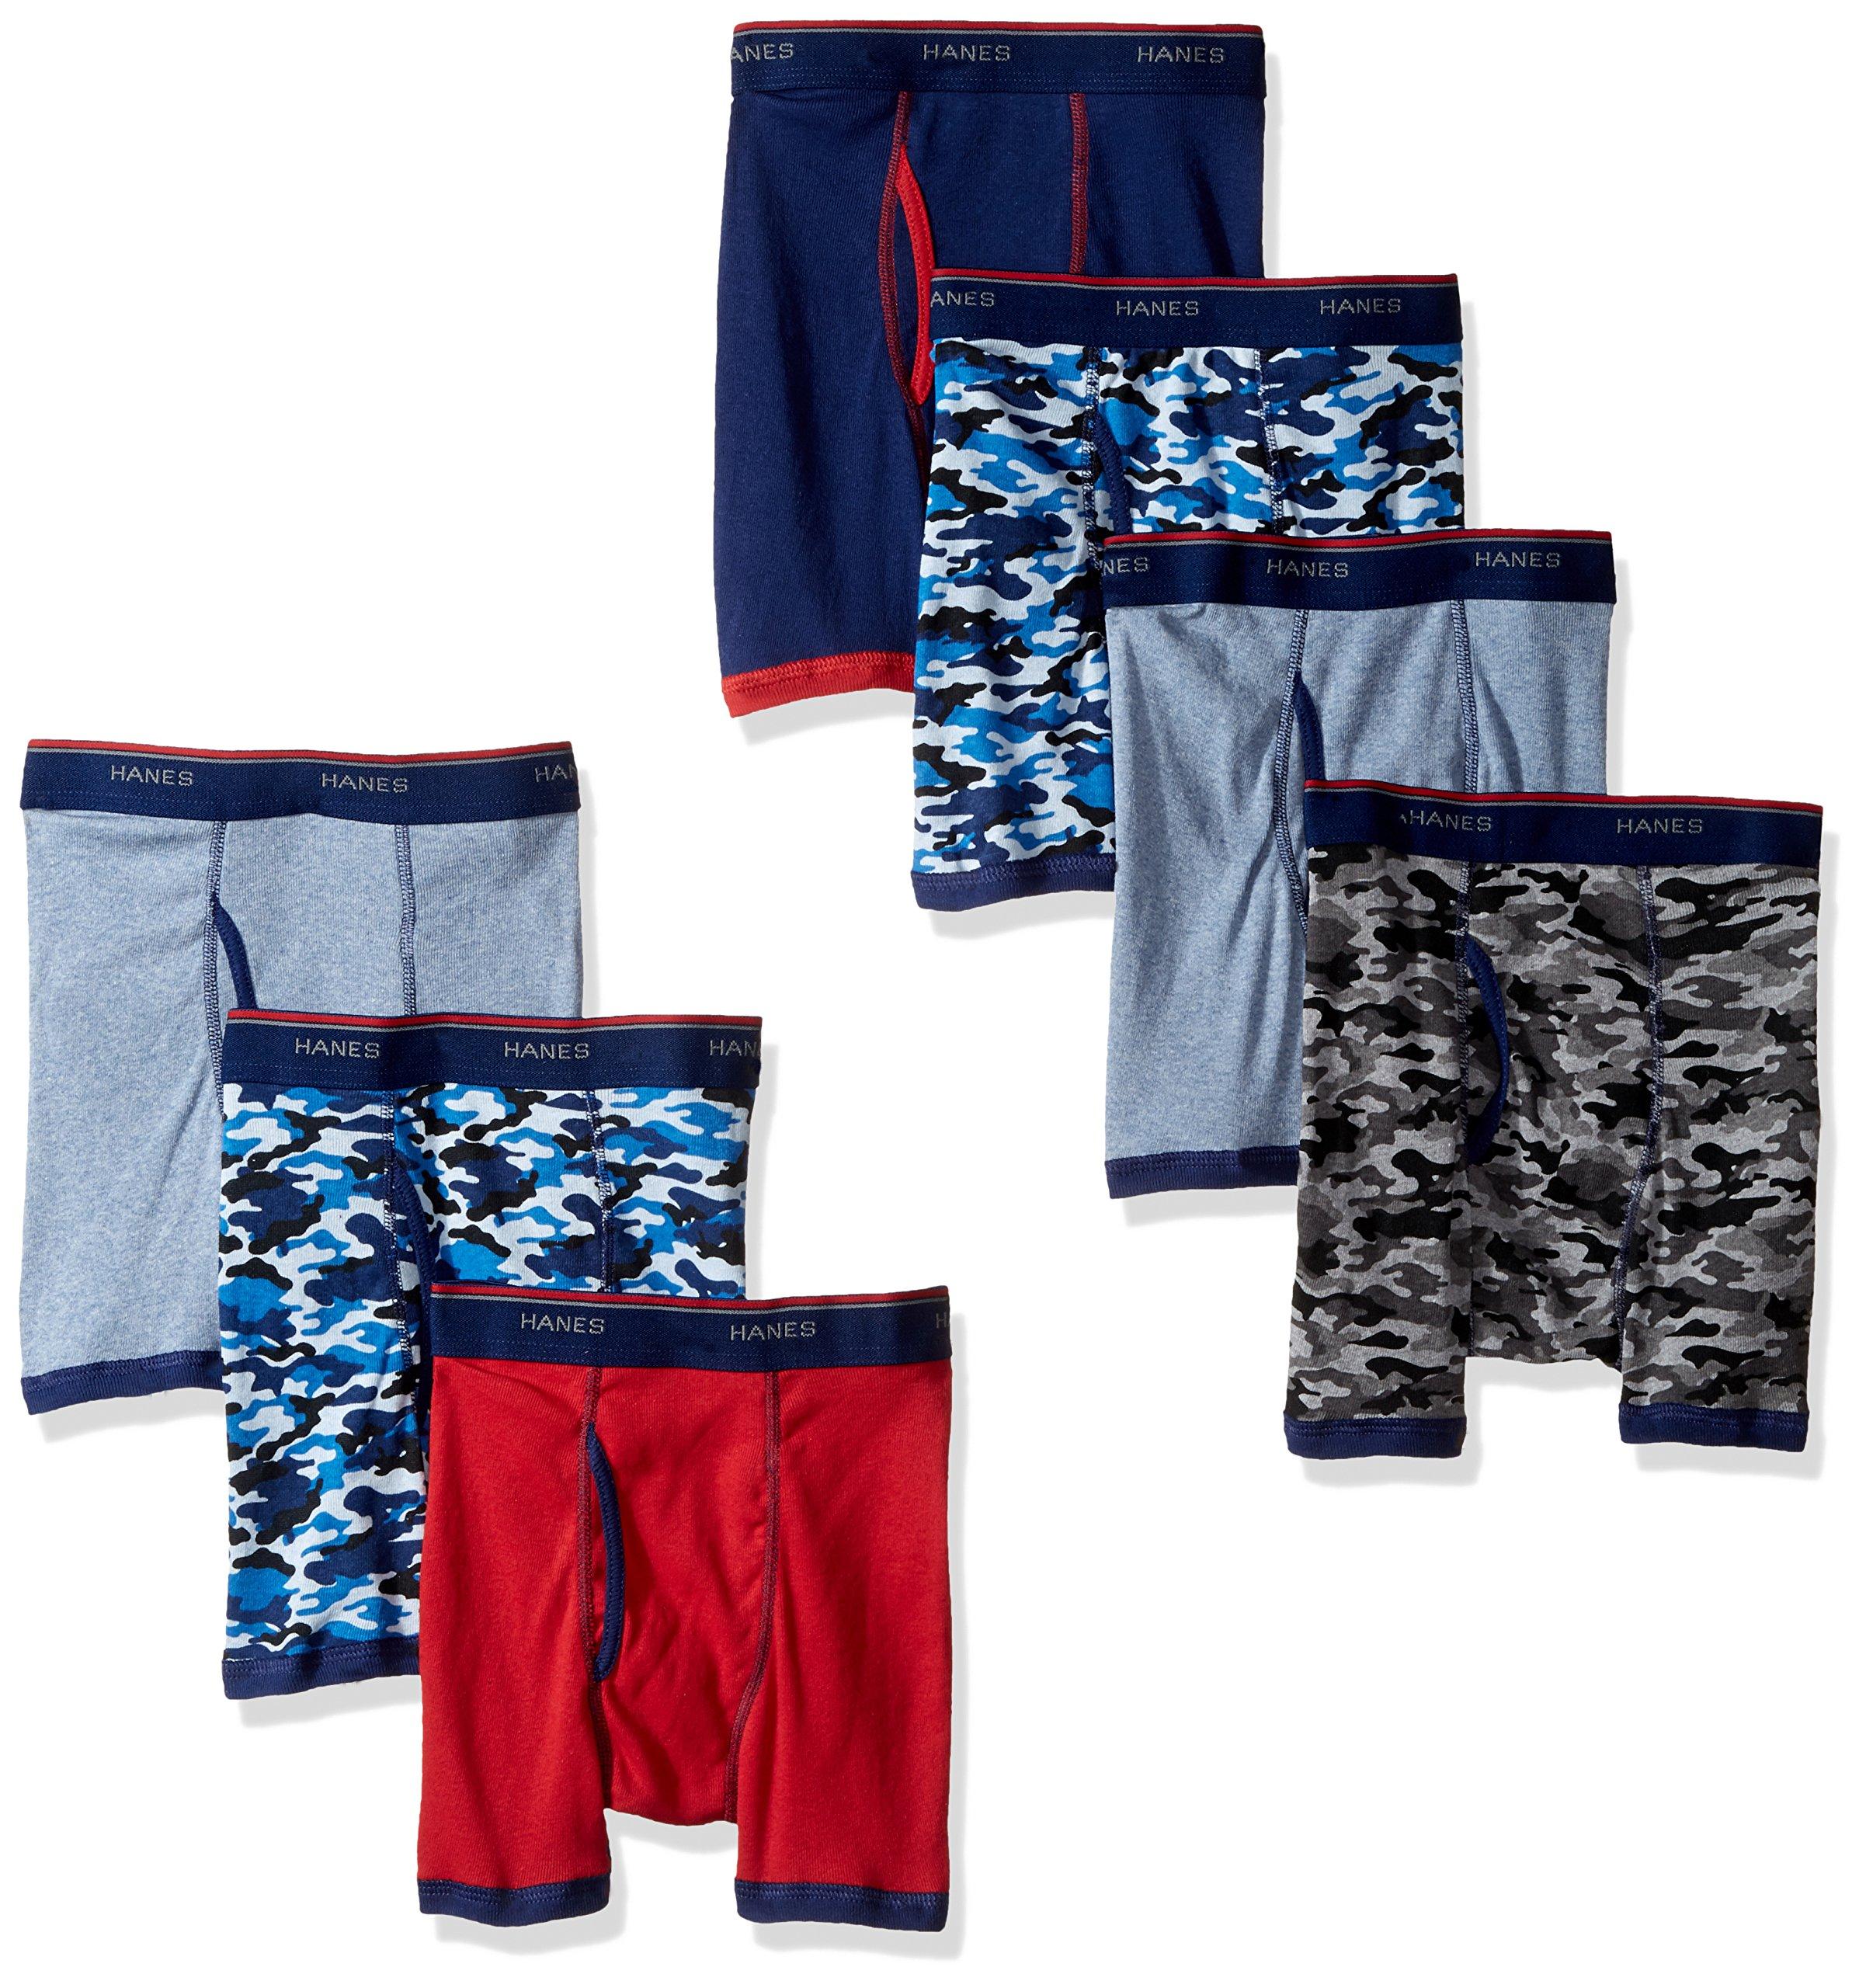 Hanes Boys Red Label Comfort Flex Sport Ringer Boxer Briefs 7 Pack, Assorted, Large by Hanes